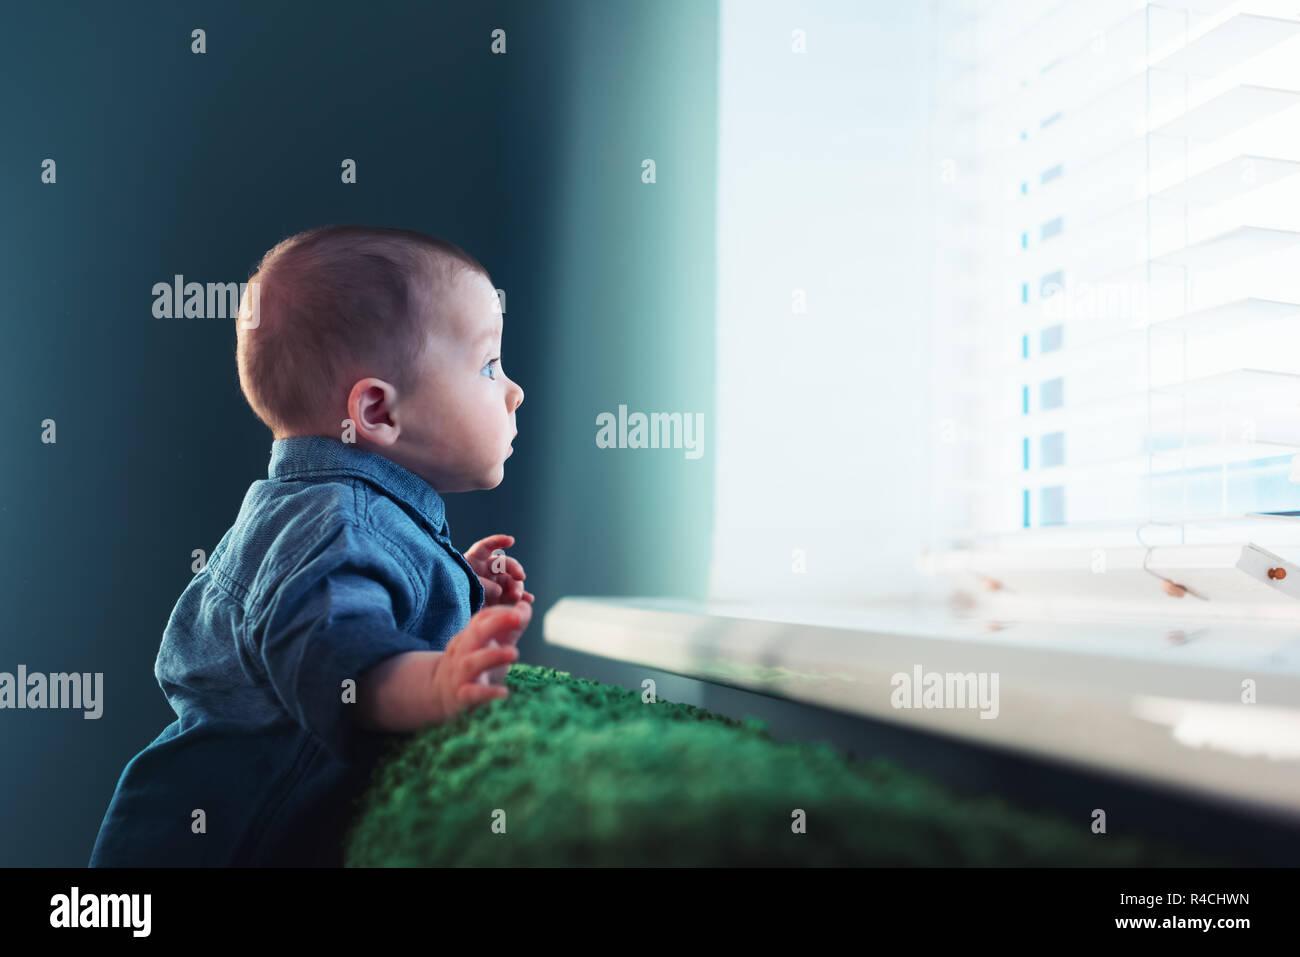 Newborn baby boy portrait on green carpet closeup. Motherhood and new life concept Stock Photo